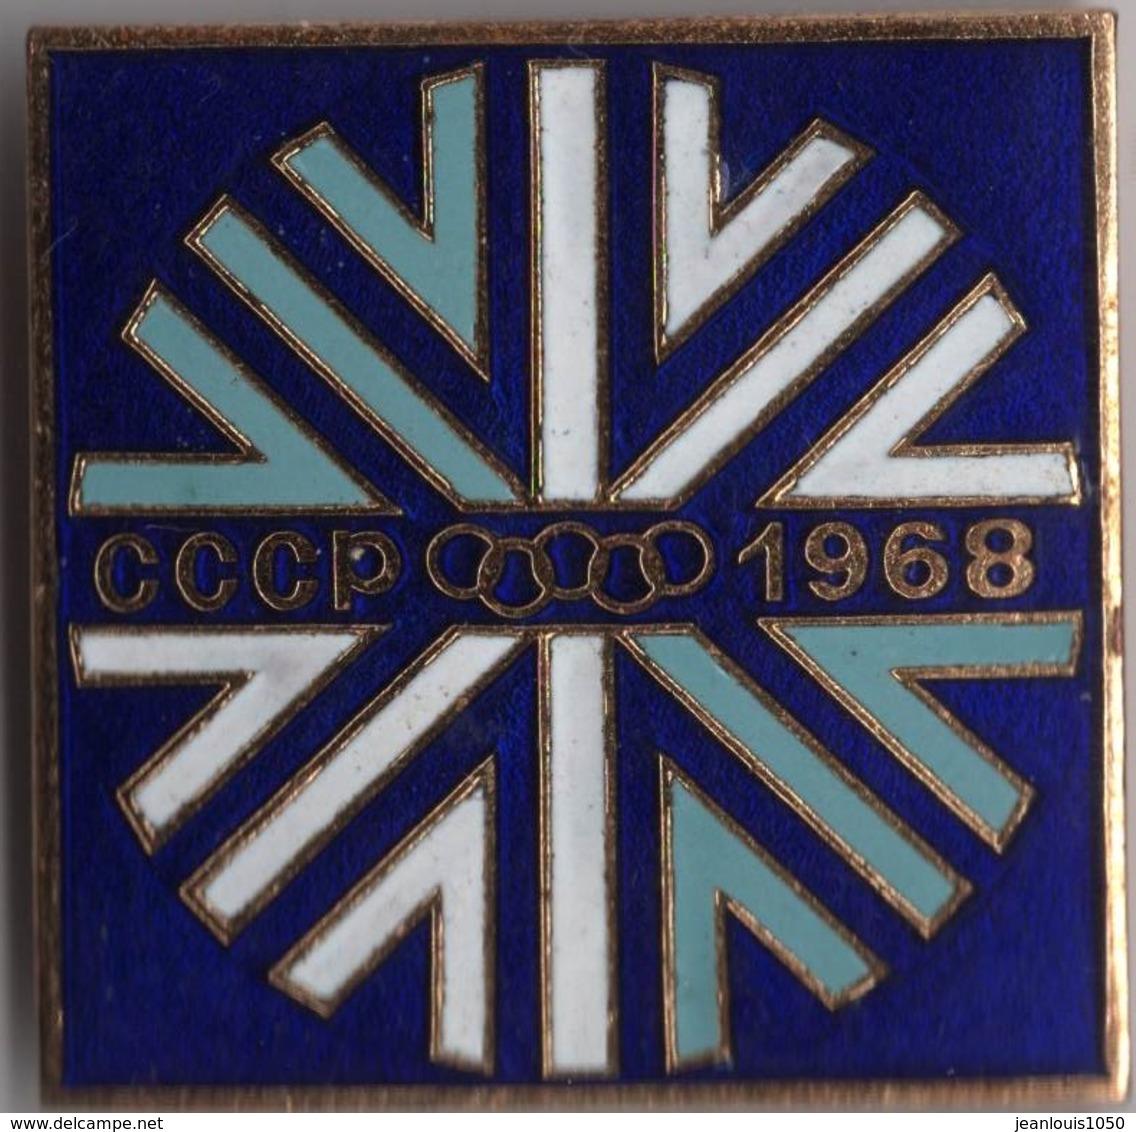 BROCHE RUSSIE JEUX OLYMPIQUES D'HIVER GRENOBLE 1968 SPORTS D'HIVER - Apparel, Souvenirs & Other